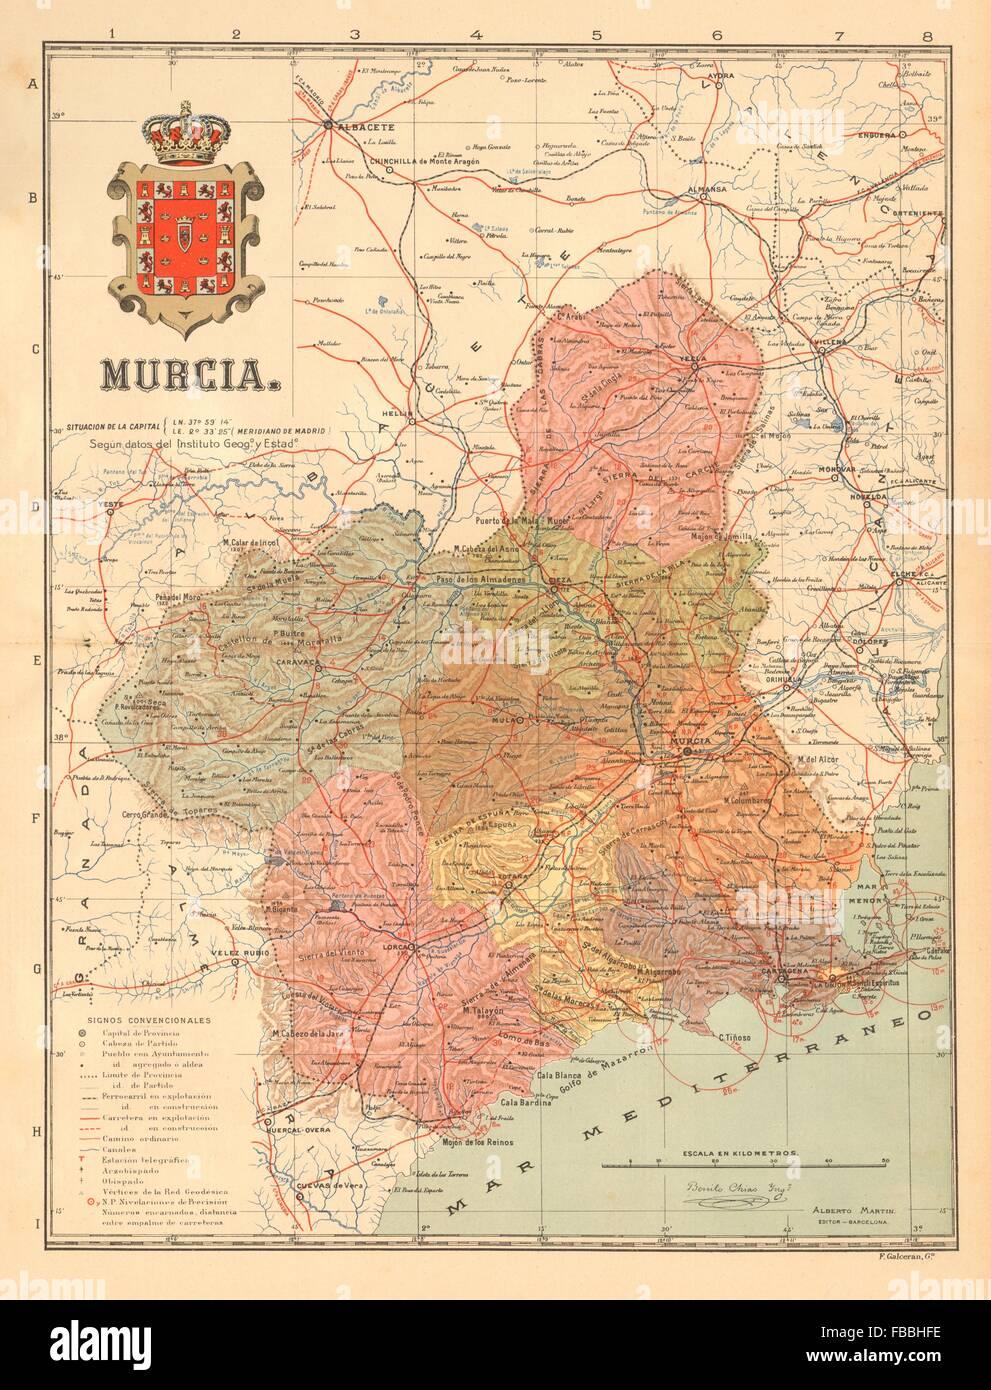 Mapa Region De Murcia.Region De Murcia Stock Photos Region De Murcia Stock